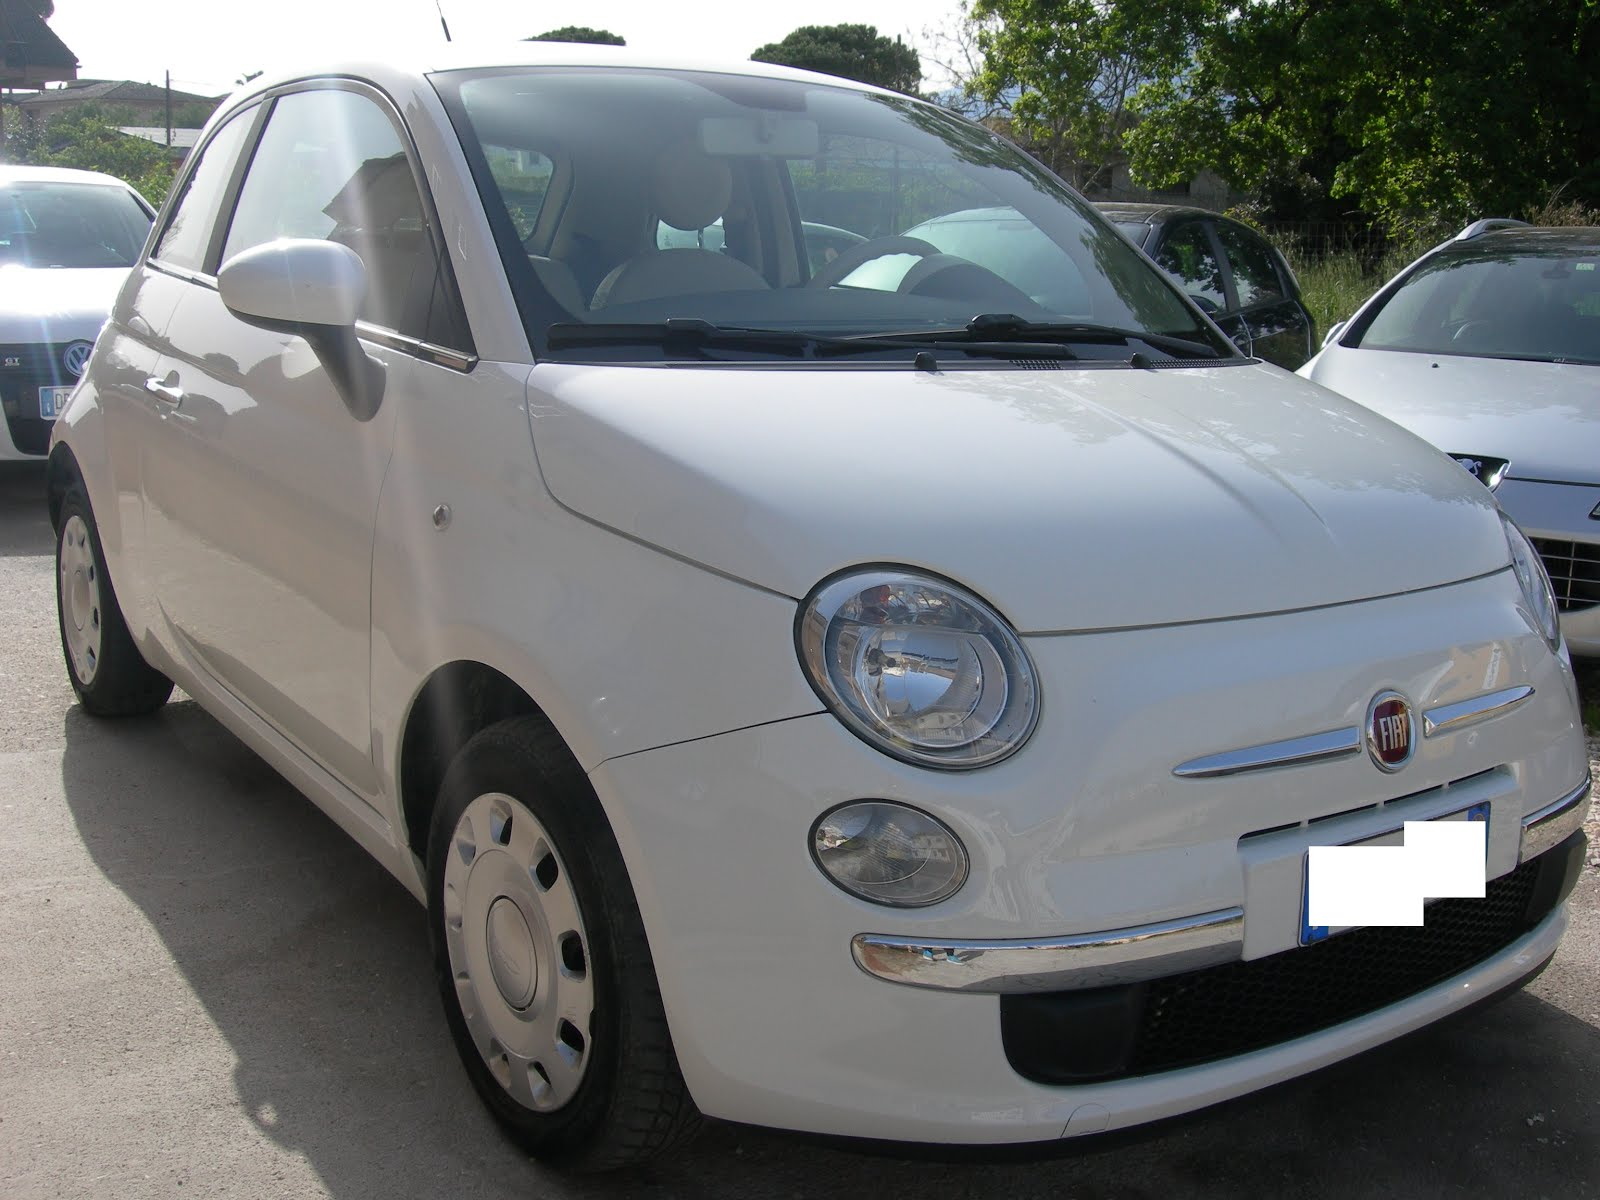 FIAT 500 1.3 M.JET 75 CV MOD: POP ANNO 2008 FULL OPTIONAL